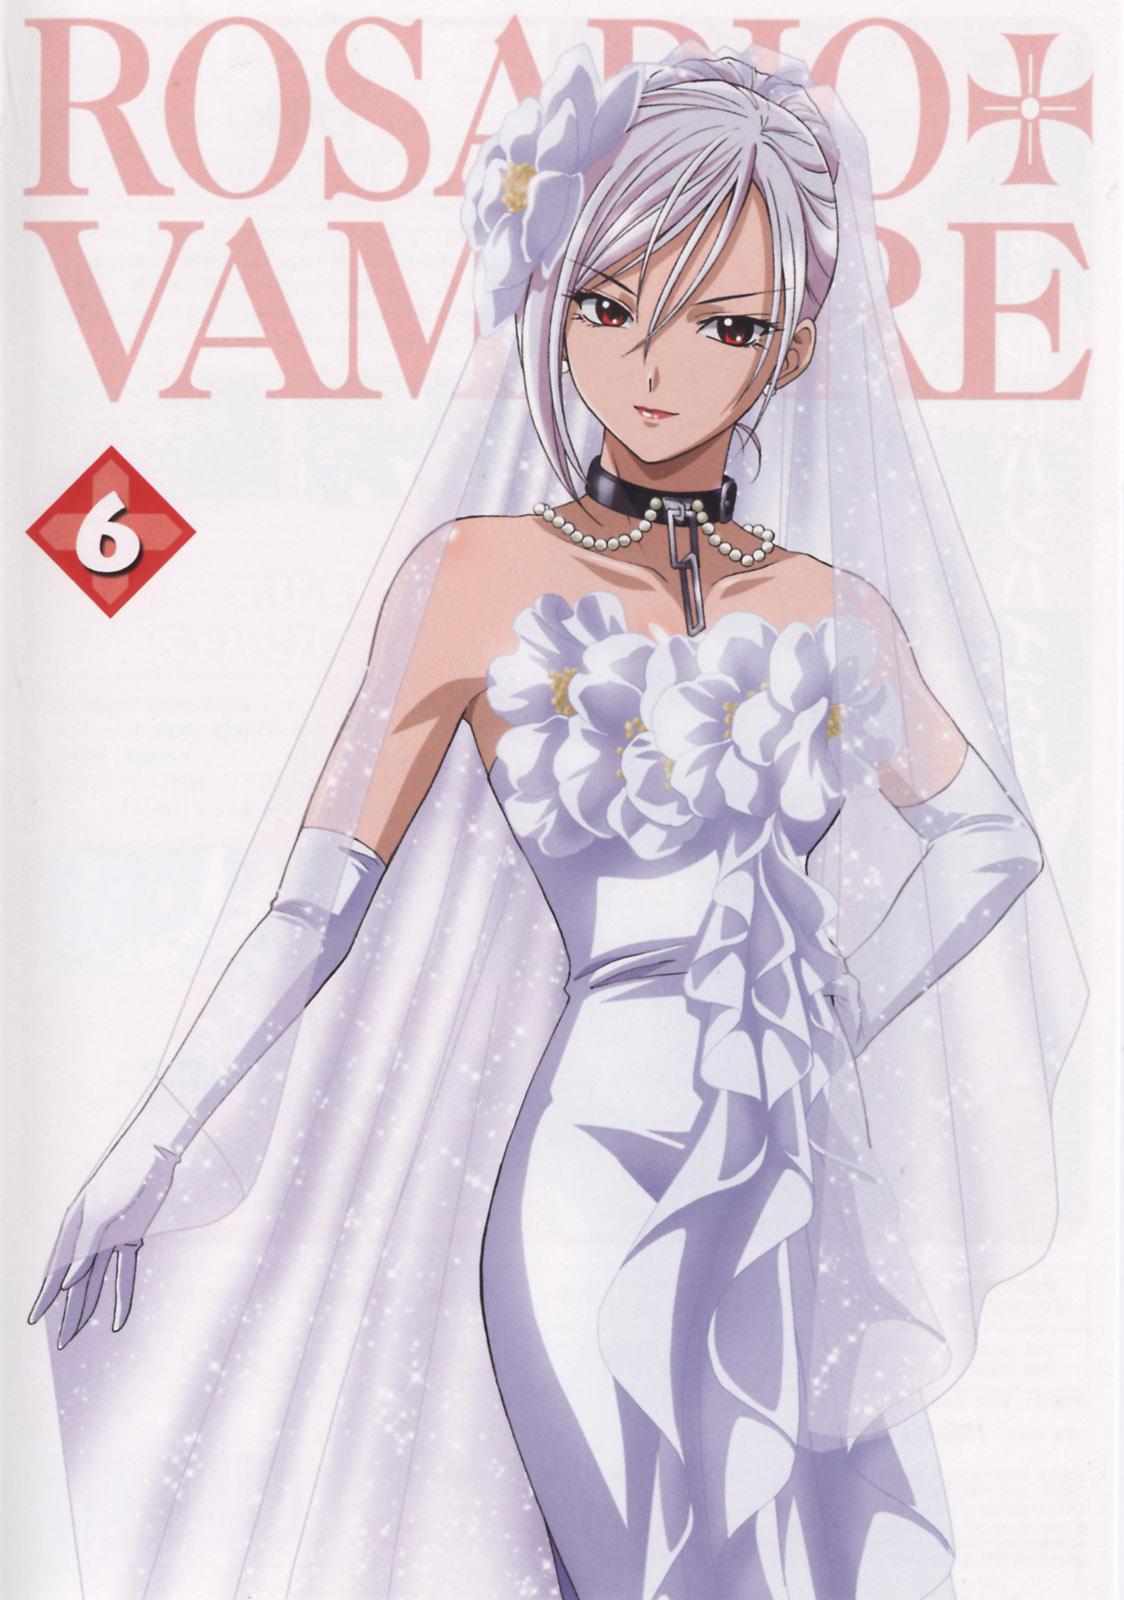 3d rosario vampire xxx pics